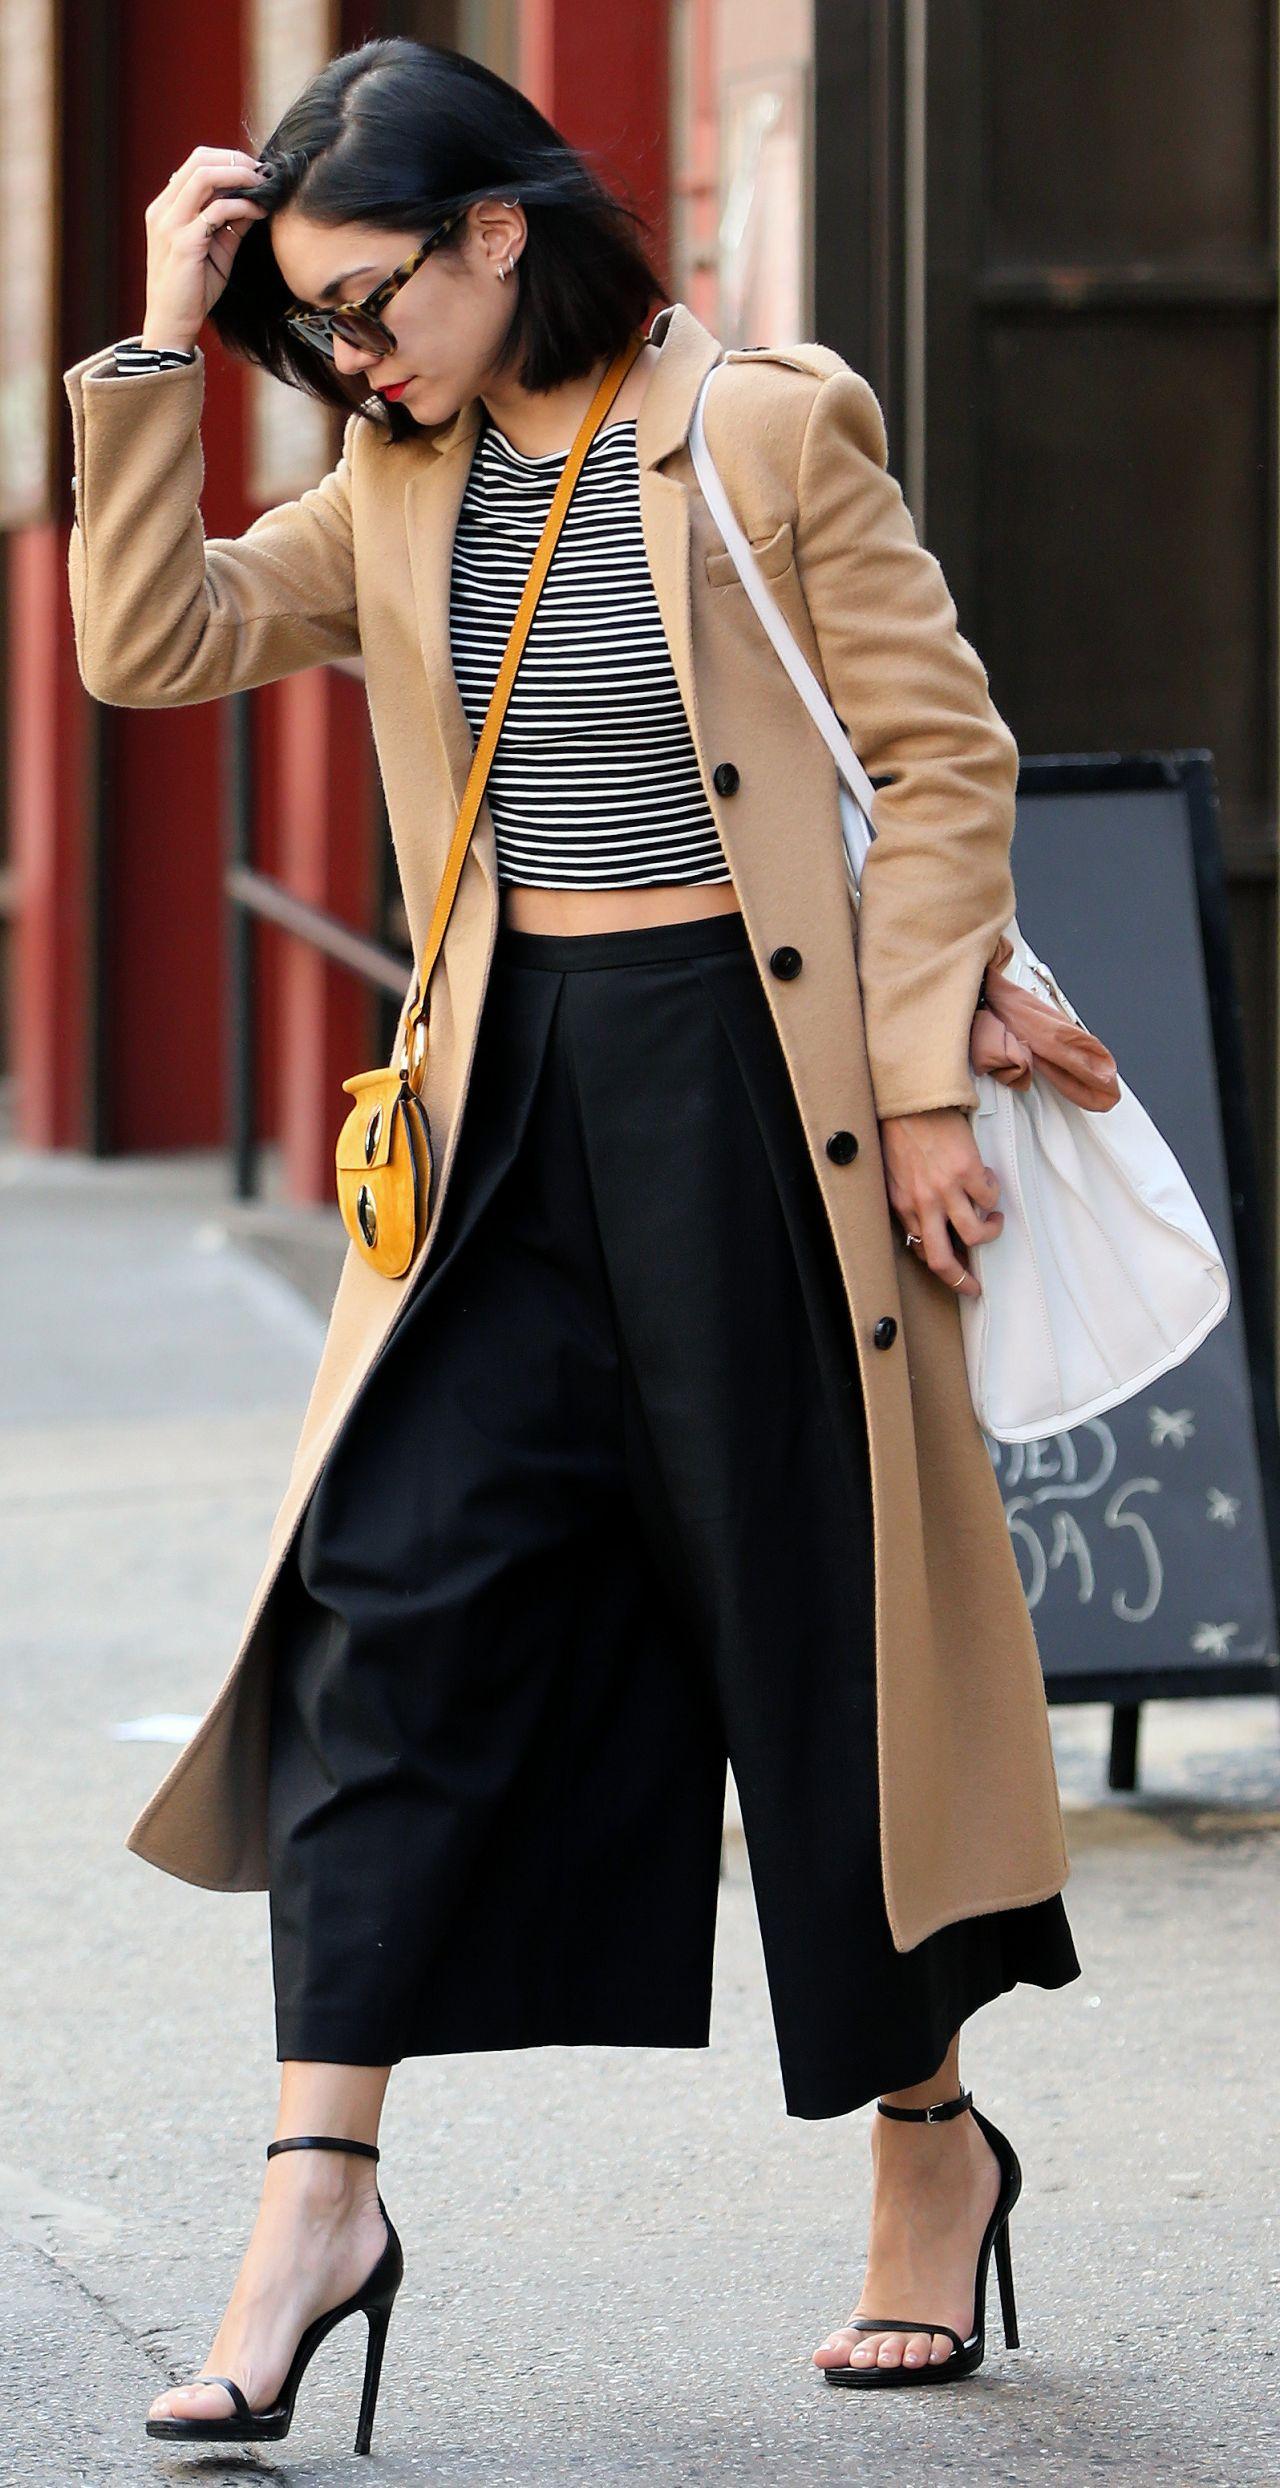 Vanessa Hudgens Spring Style - Leaving Her Apartment in Soho, April 2015